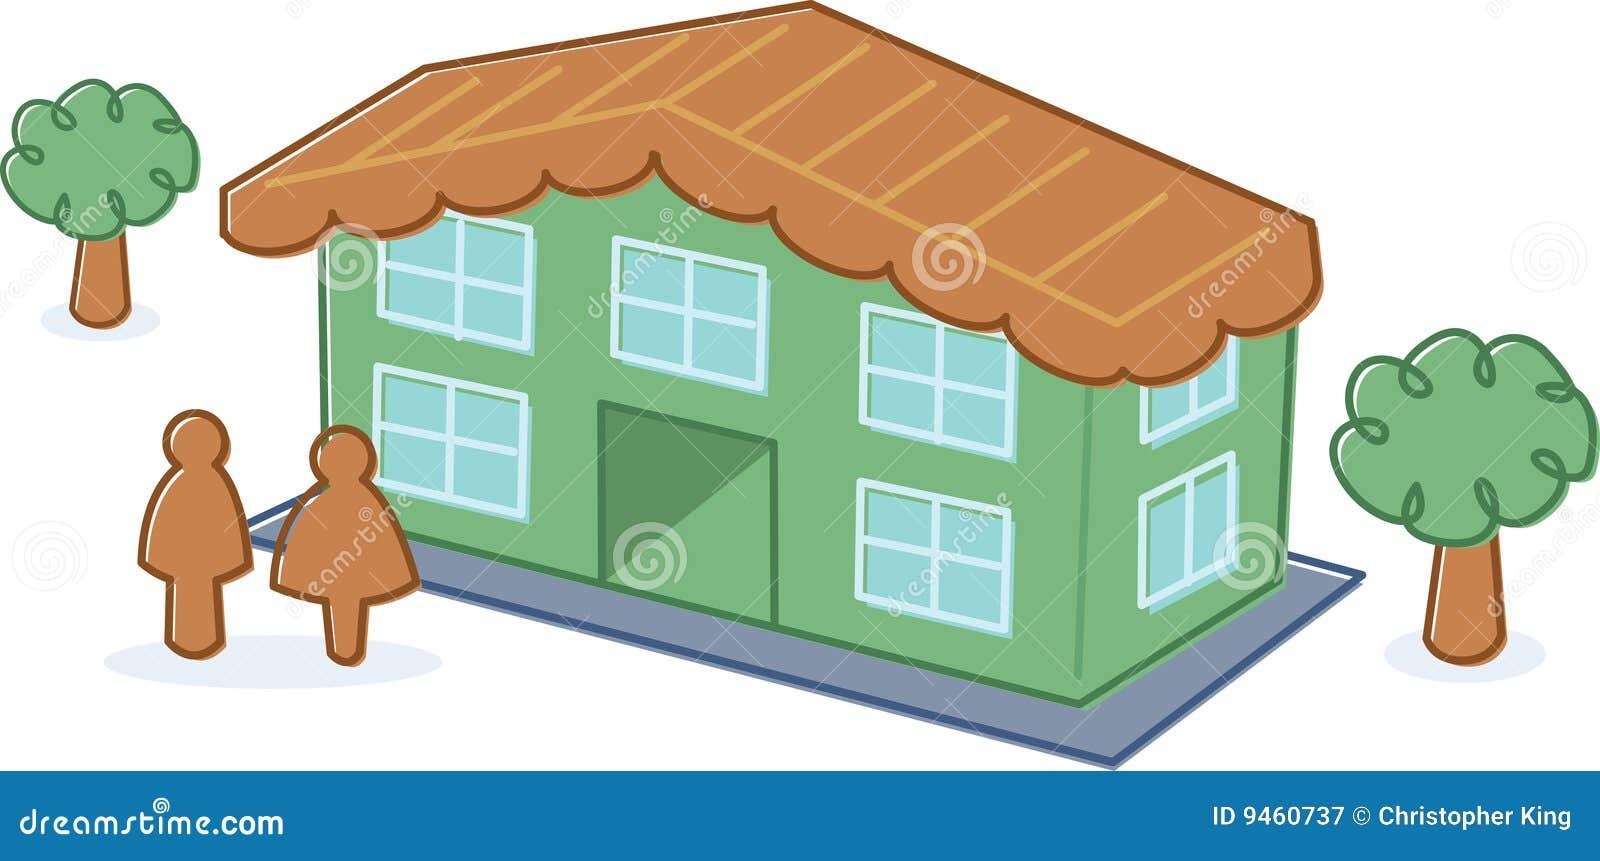 Cute toy dolls house illustration